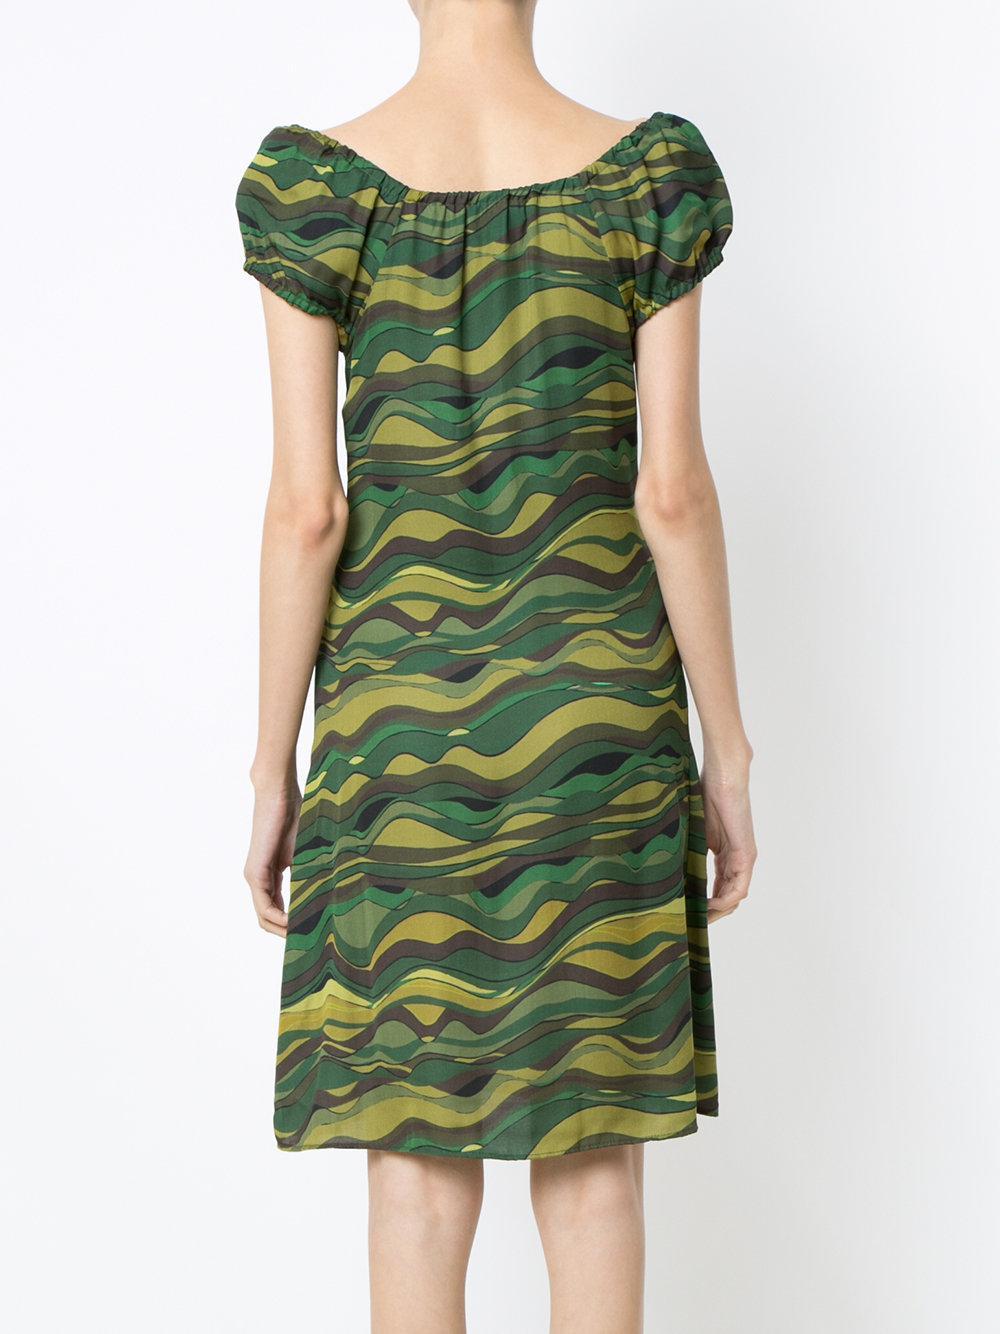 Amir Slama Wave Print Dress in Green